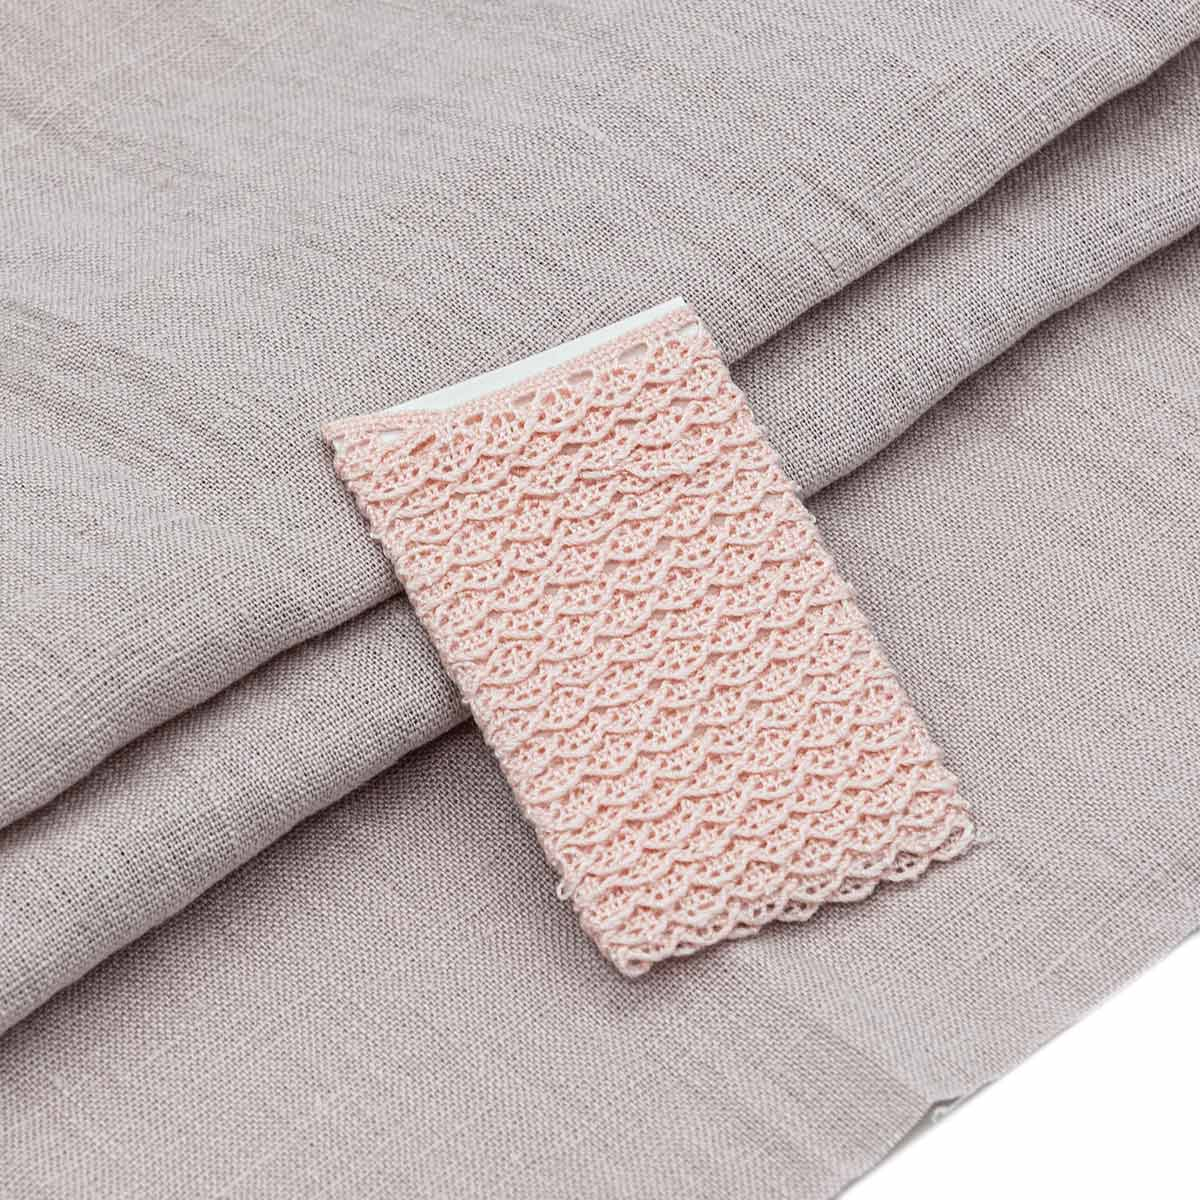 28957 Набор для творчеста 'Ткань лён с тесьмой ' (100% лен / 100%хб. 45*50см/ 2м), цв.п.роза+розовый